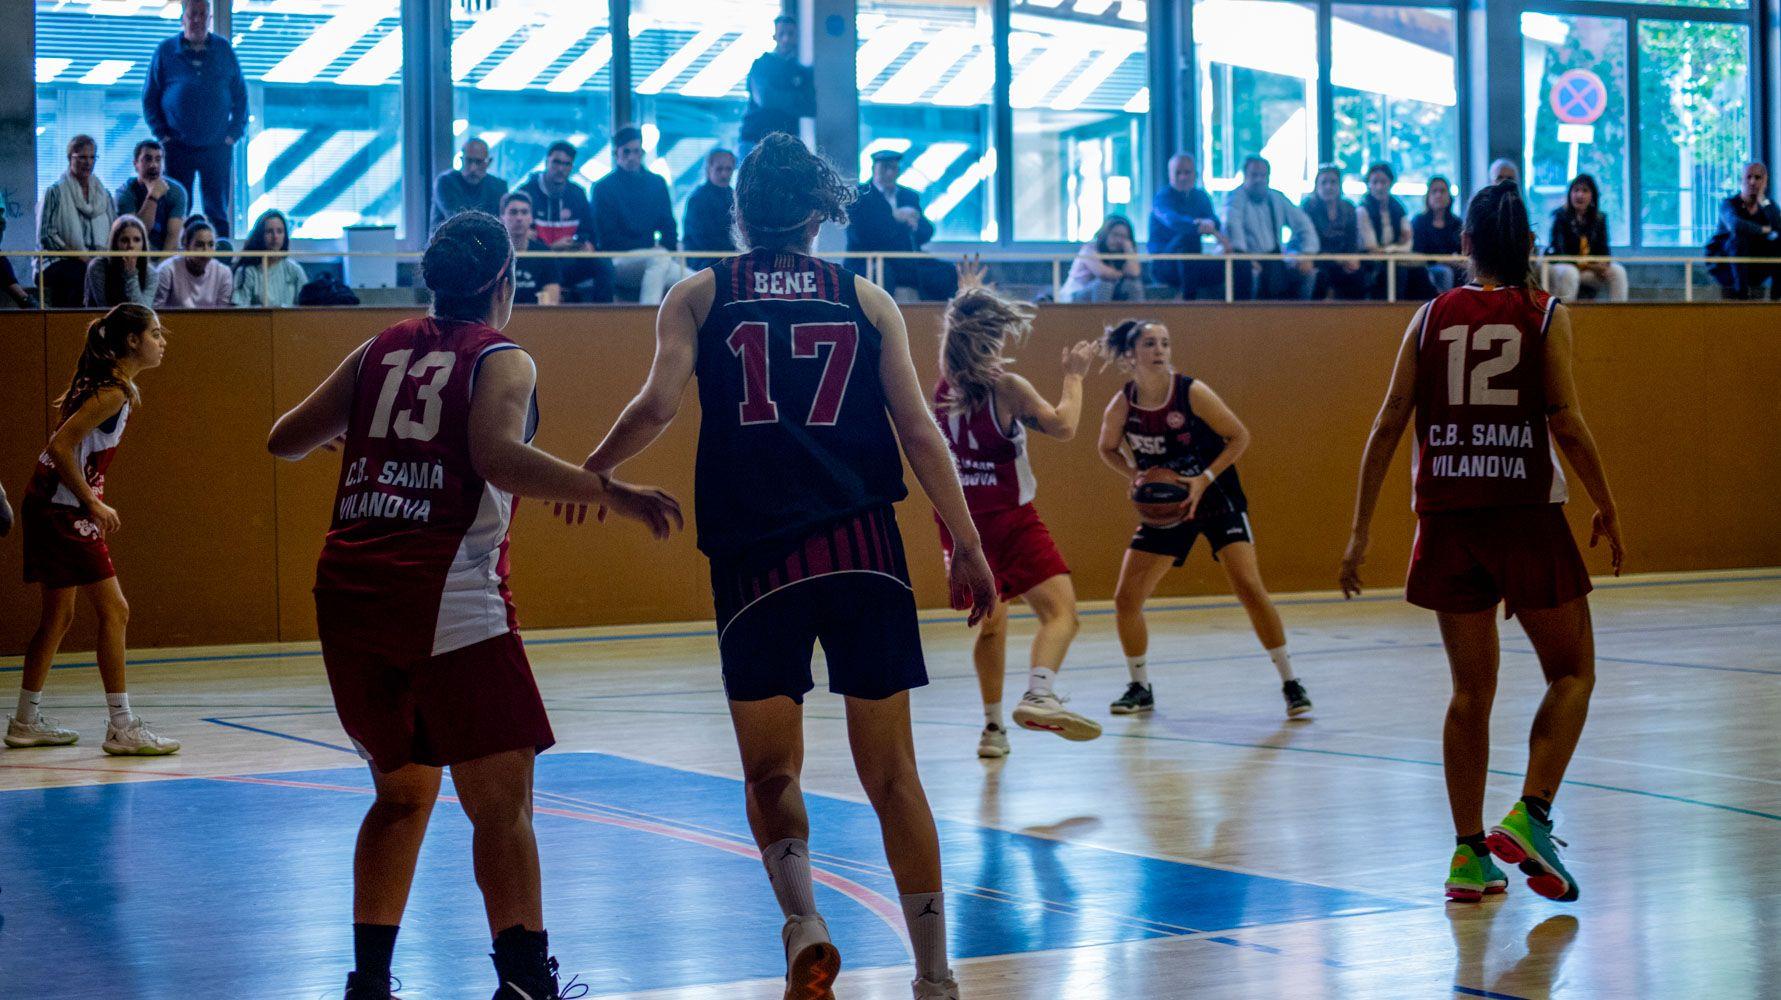 Bàsquet femení. Partit de lliga. UE Sant Cugat-Bàsquet Samà Vilanova.Foto: Adrián Gómez